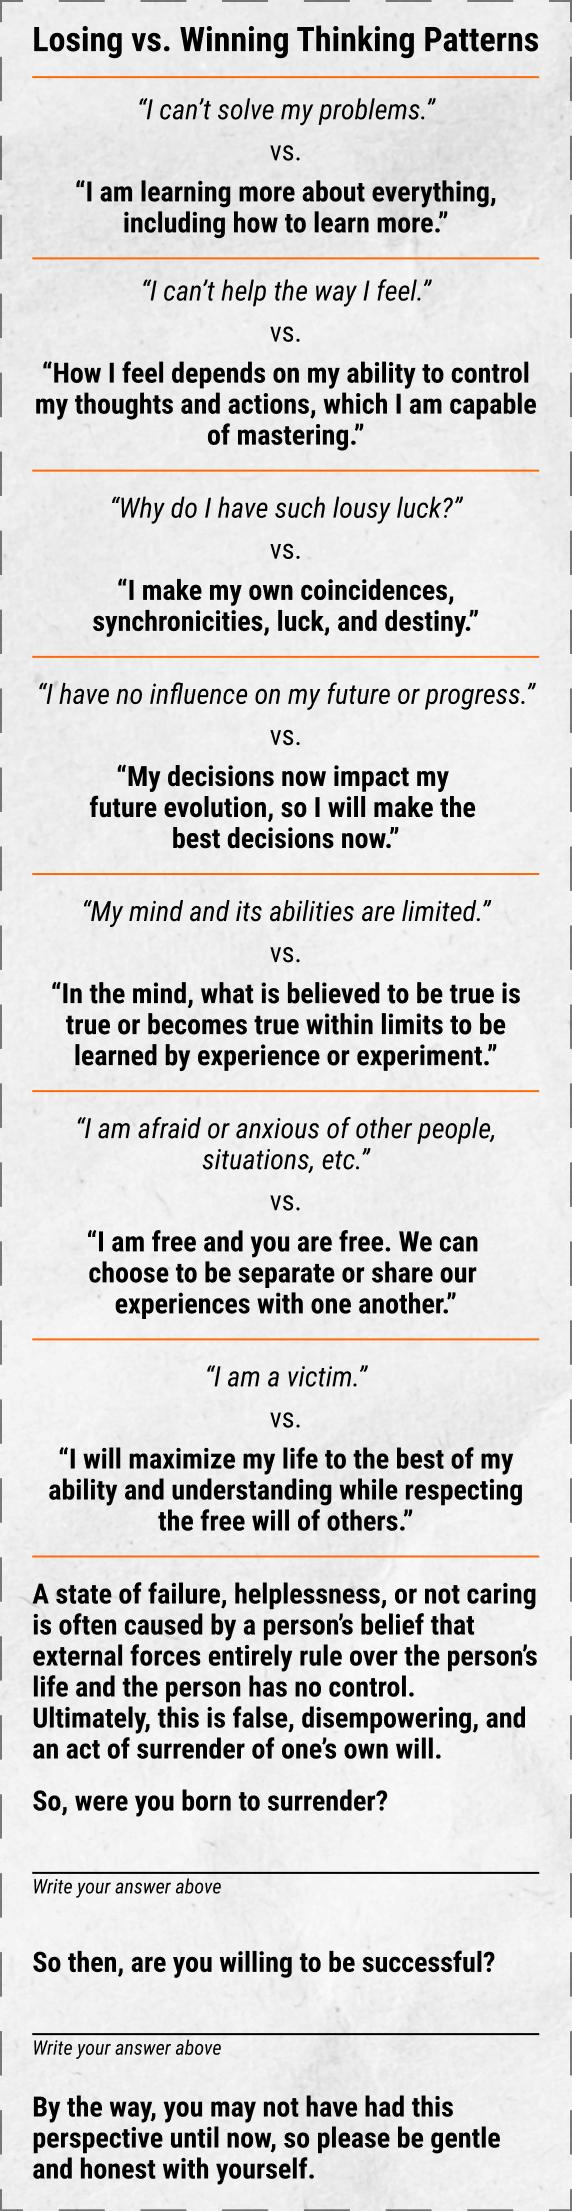 Winning vs. Losing Trading Self-Help Advice